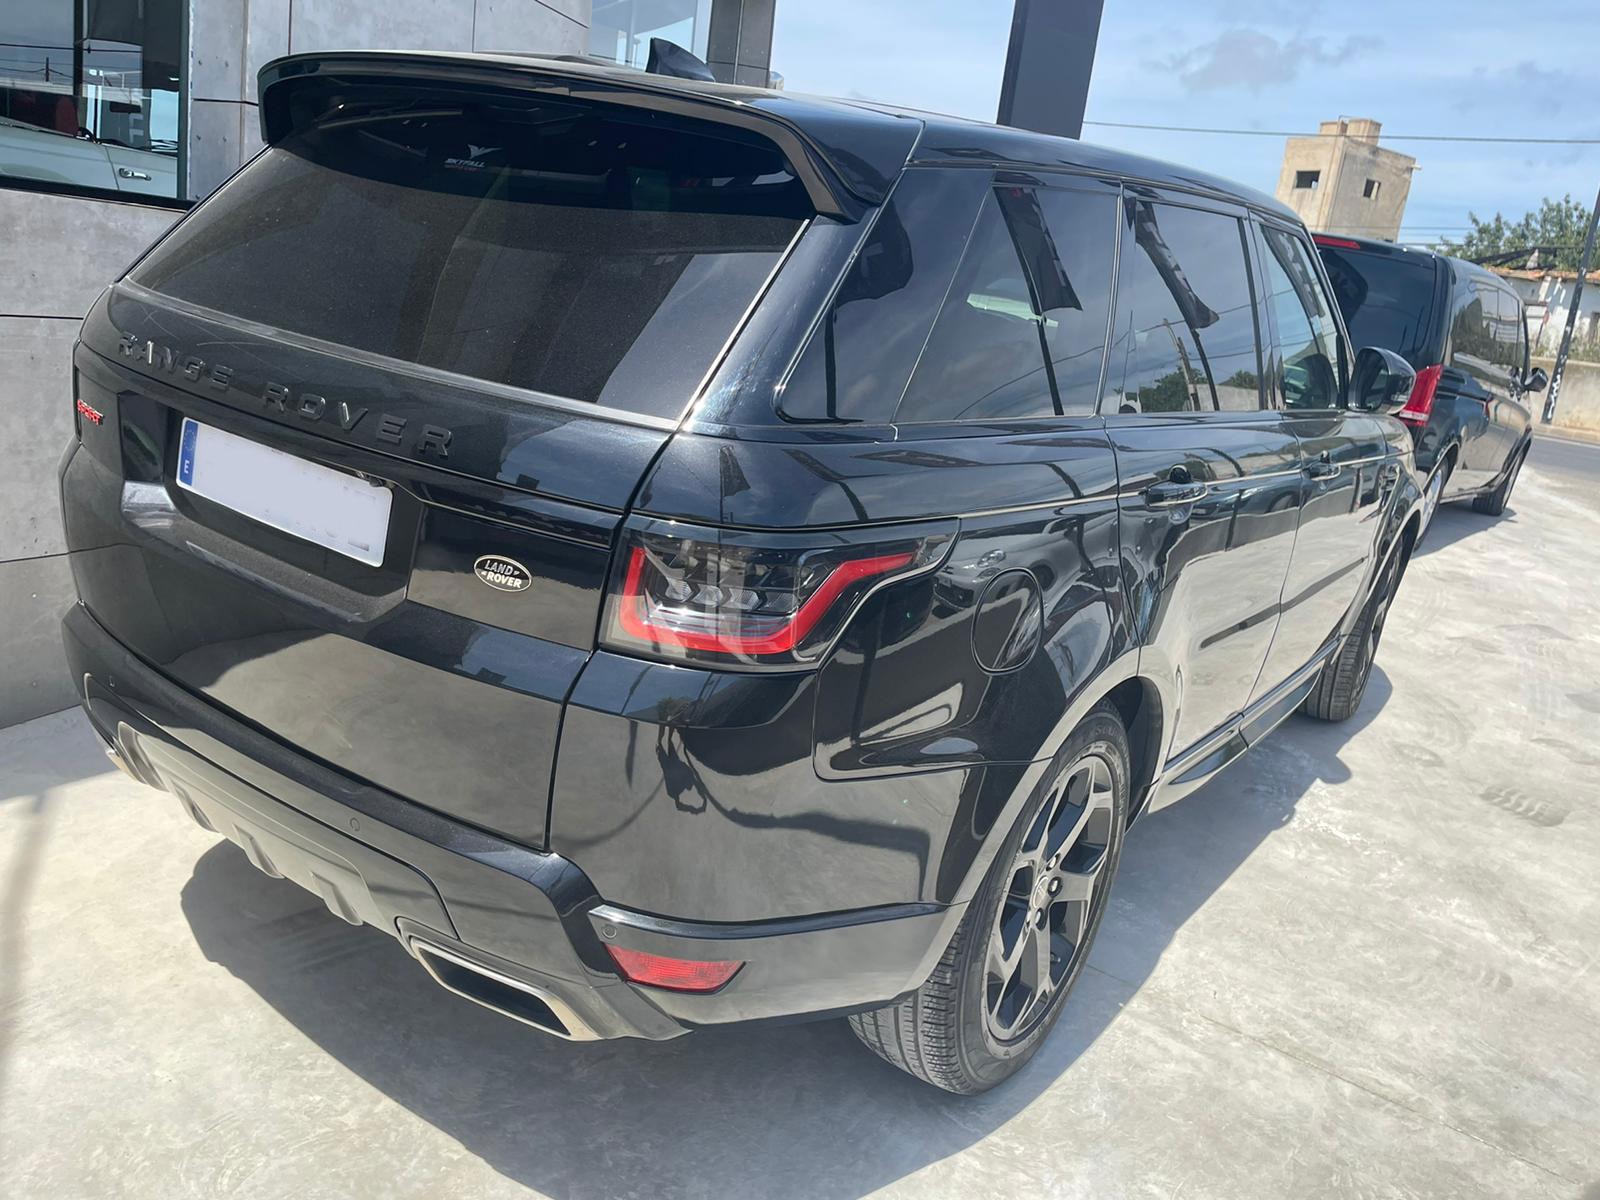 Range-Rover-Sport-7-seats-Rental-Ibiza-2